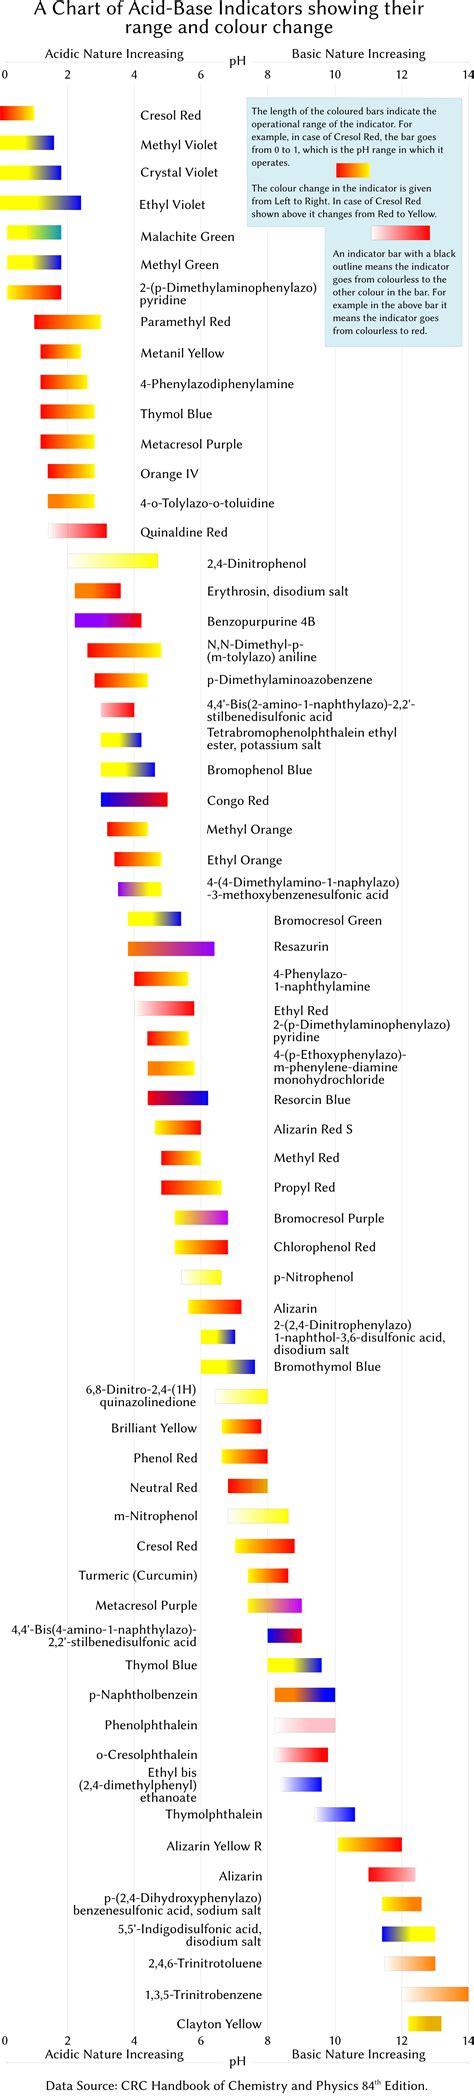 litmus paper for ph measurement